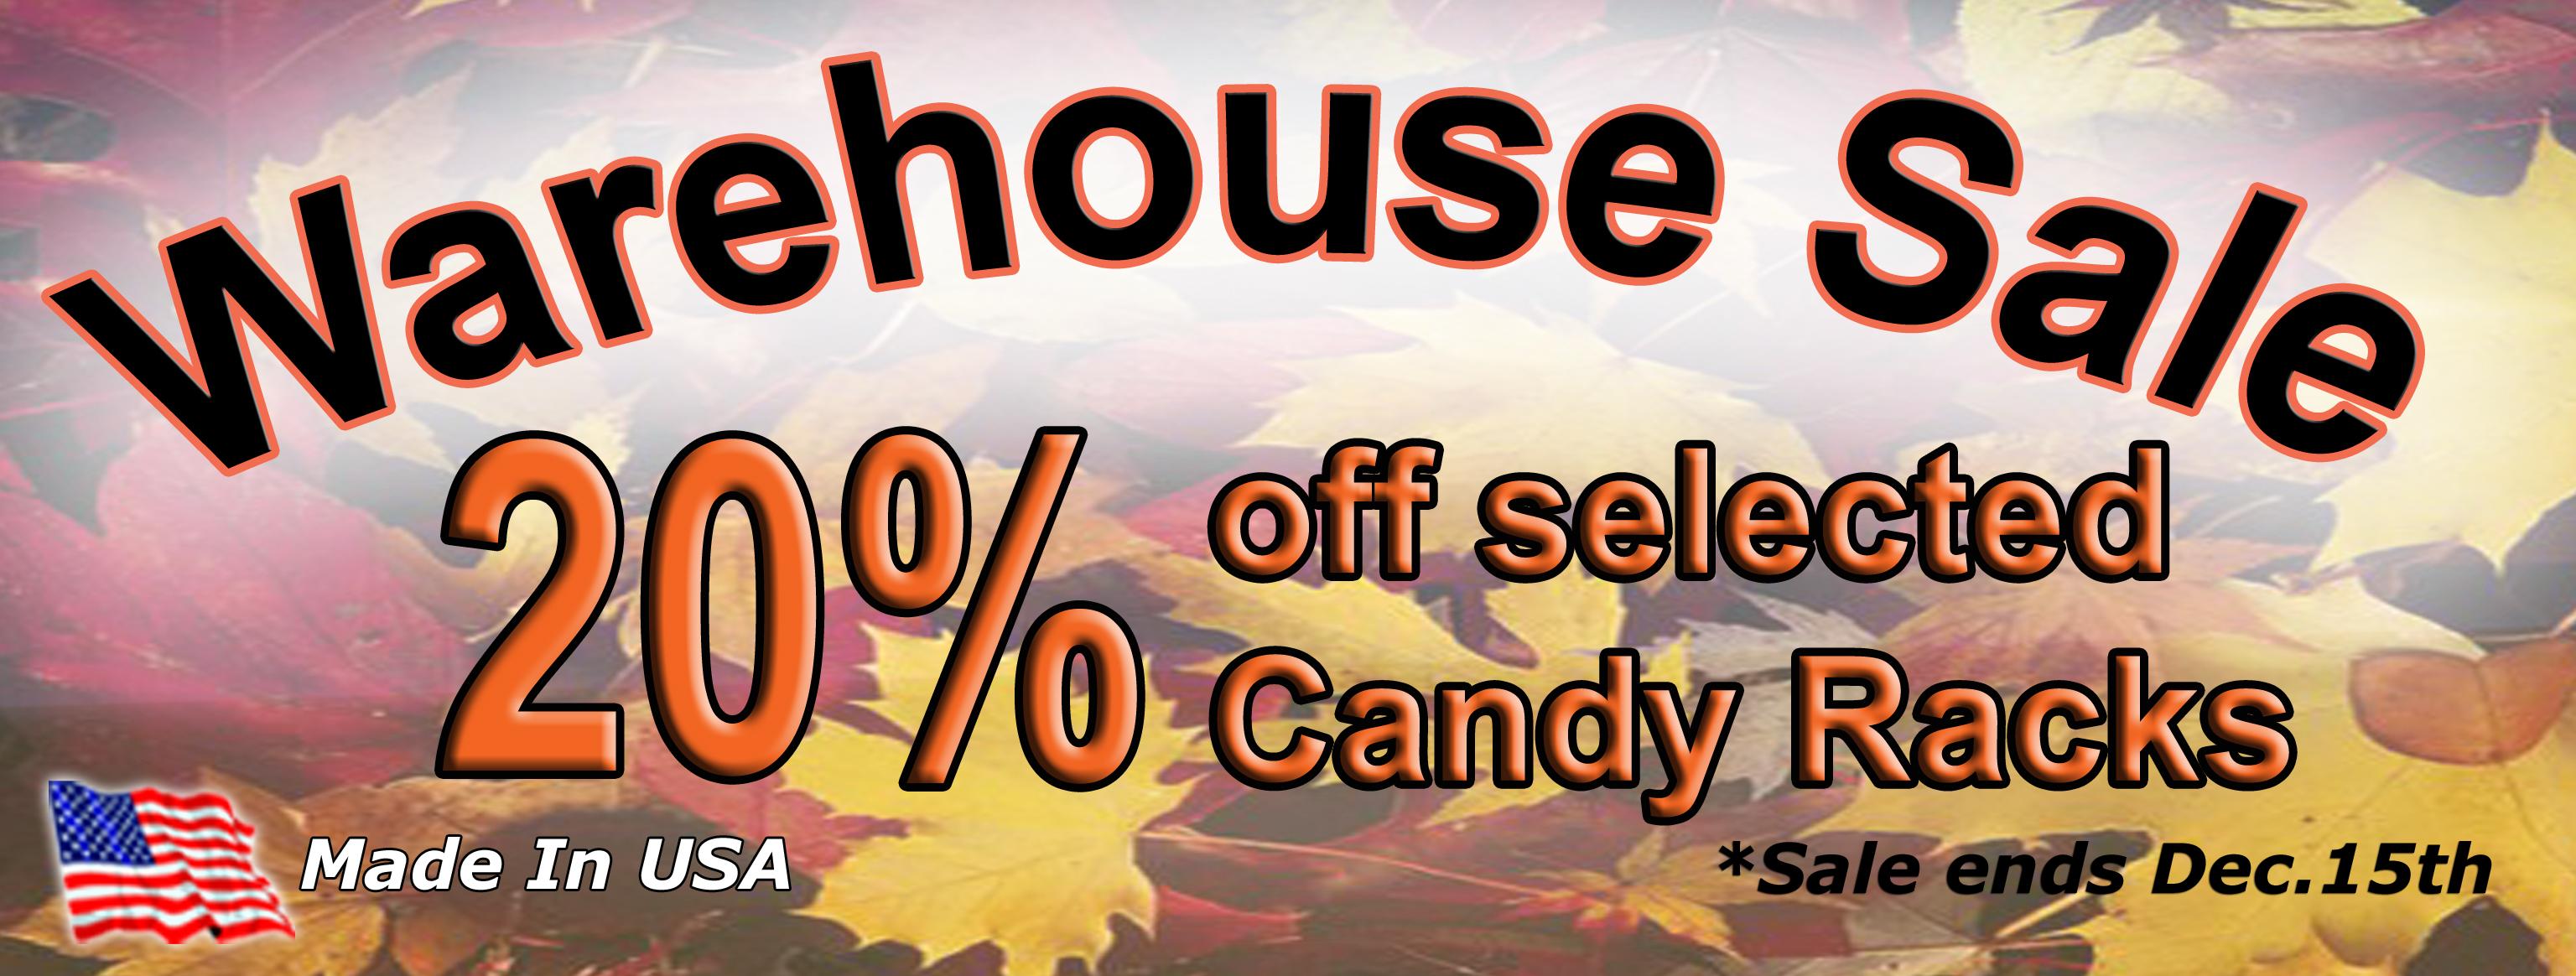 warehouse-sale-header.jpg